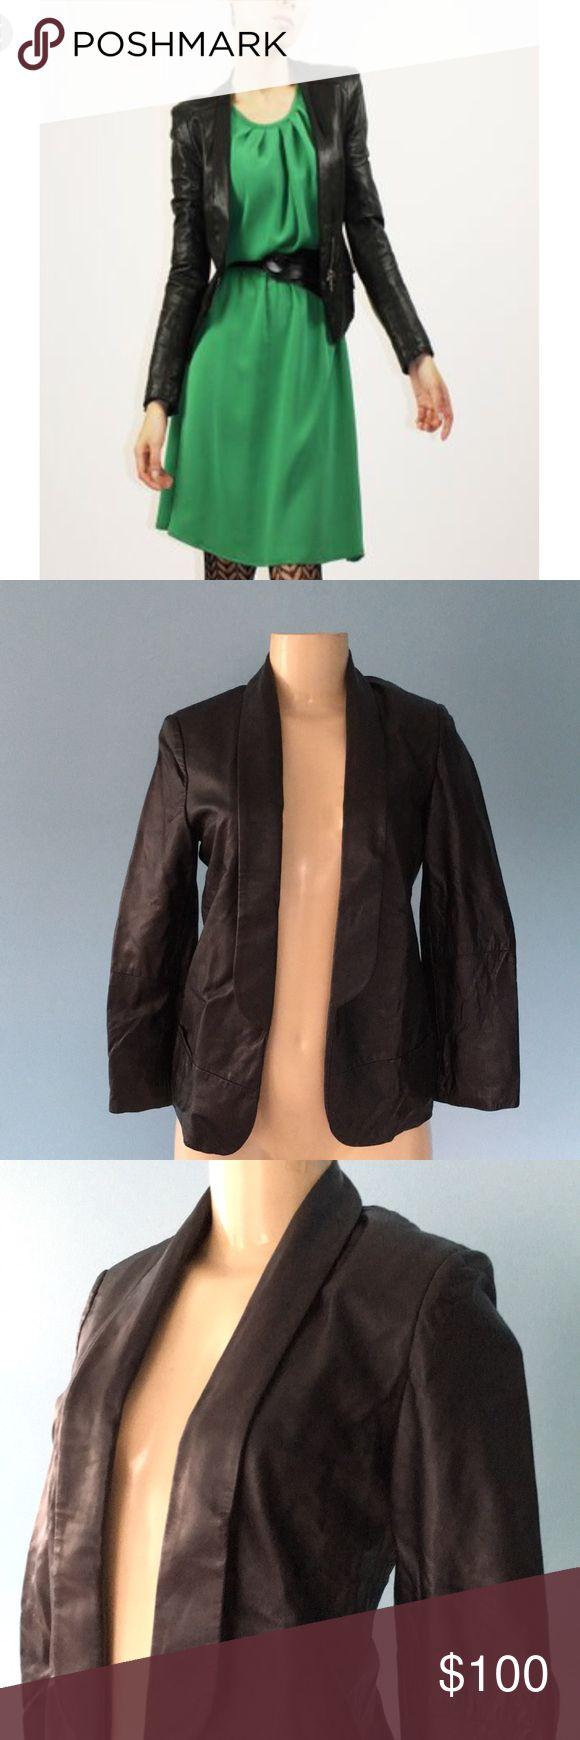 Vintage Black Genuine Leather Jacket, Sz XS